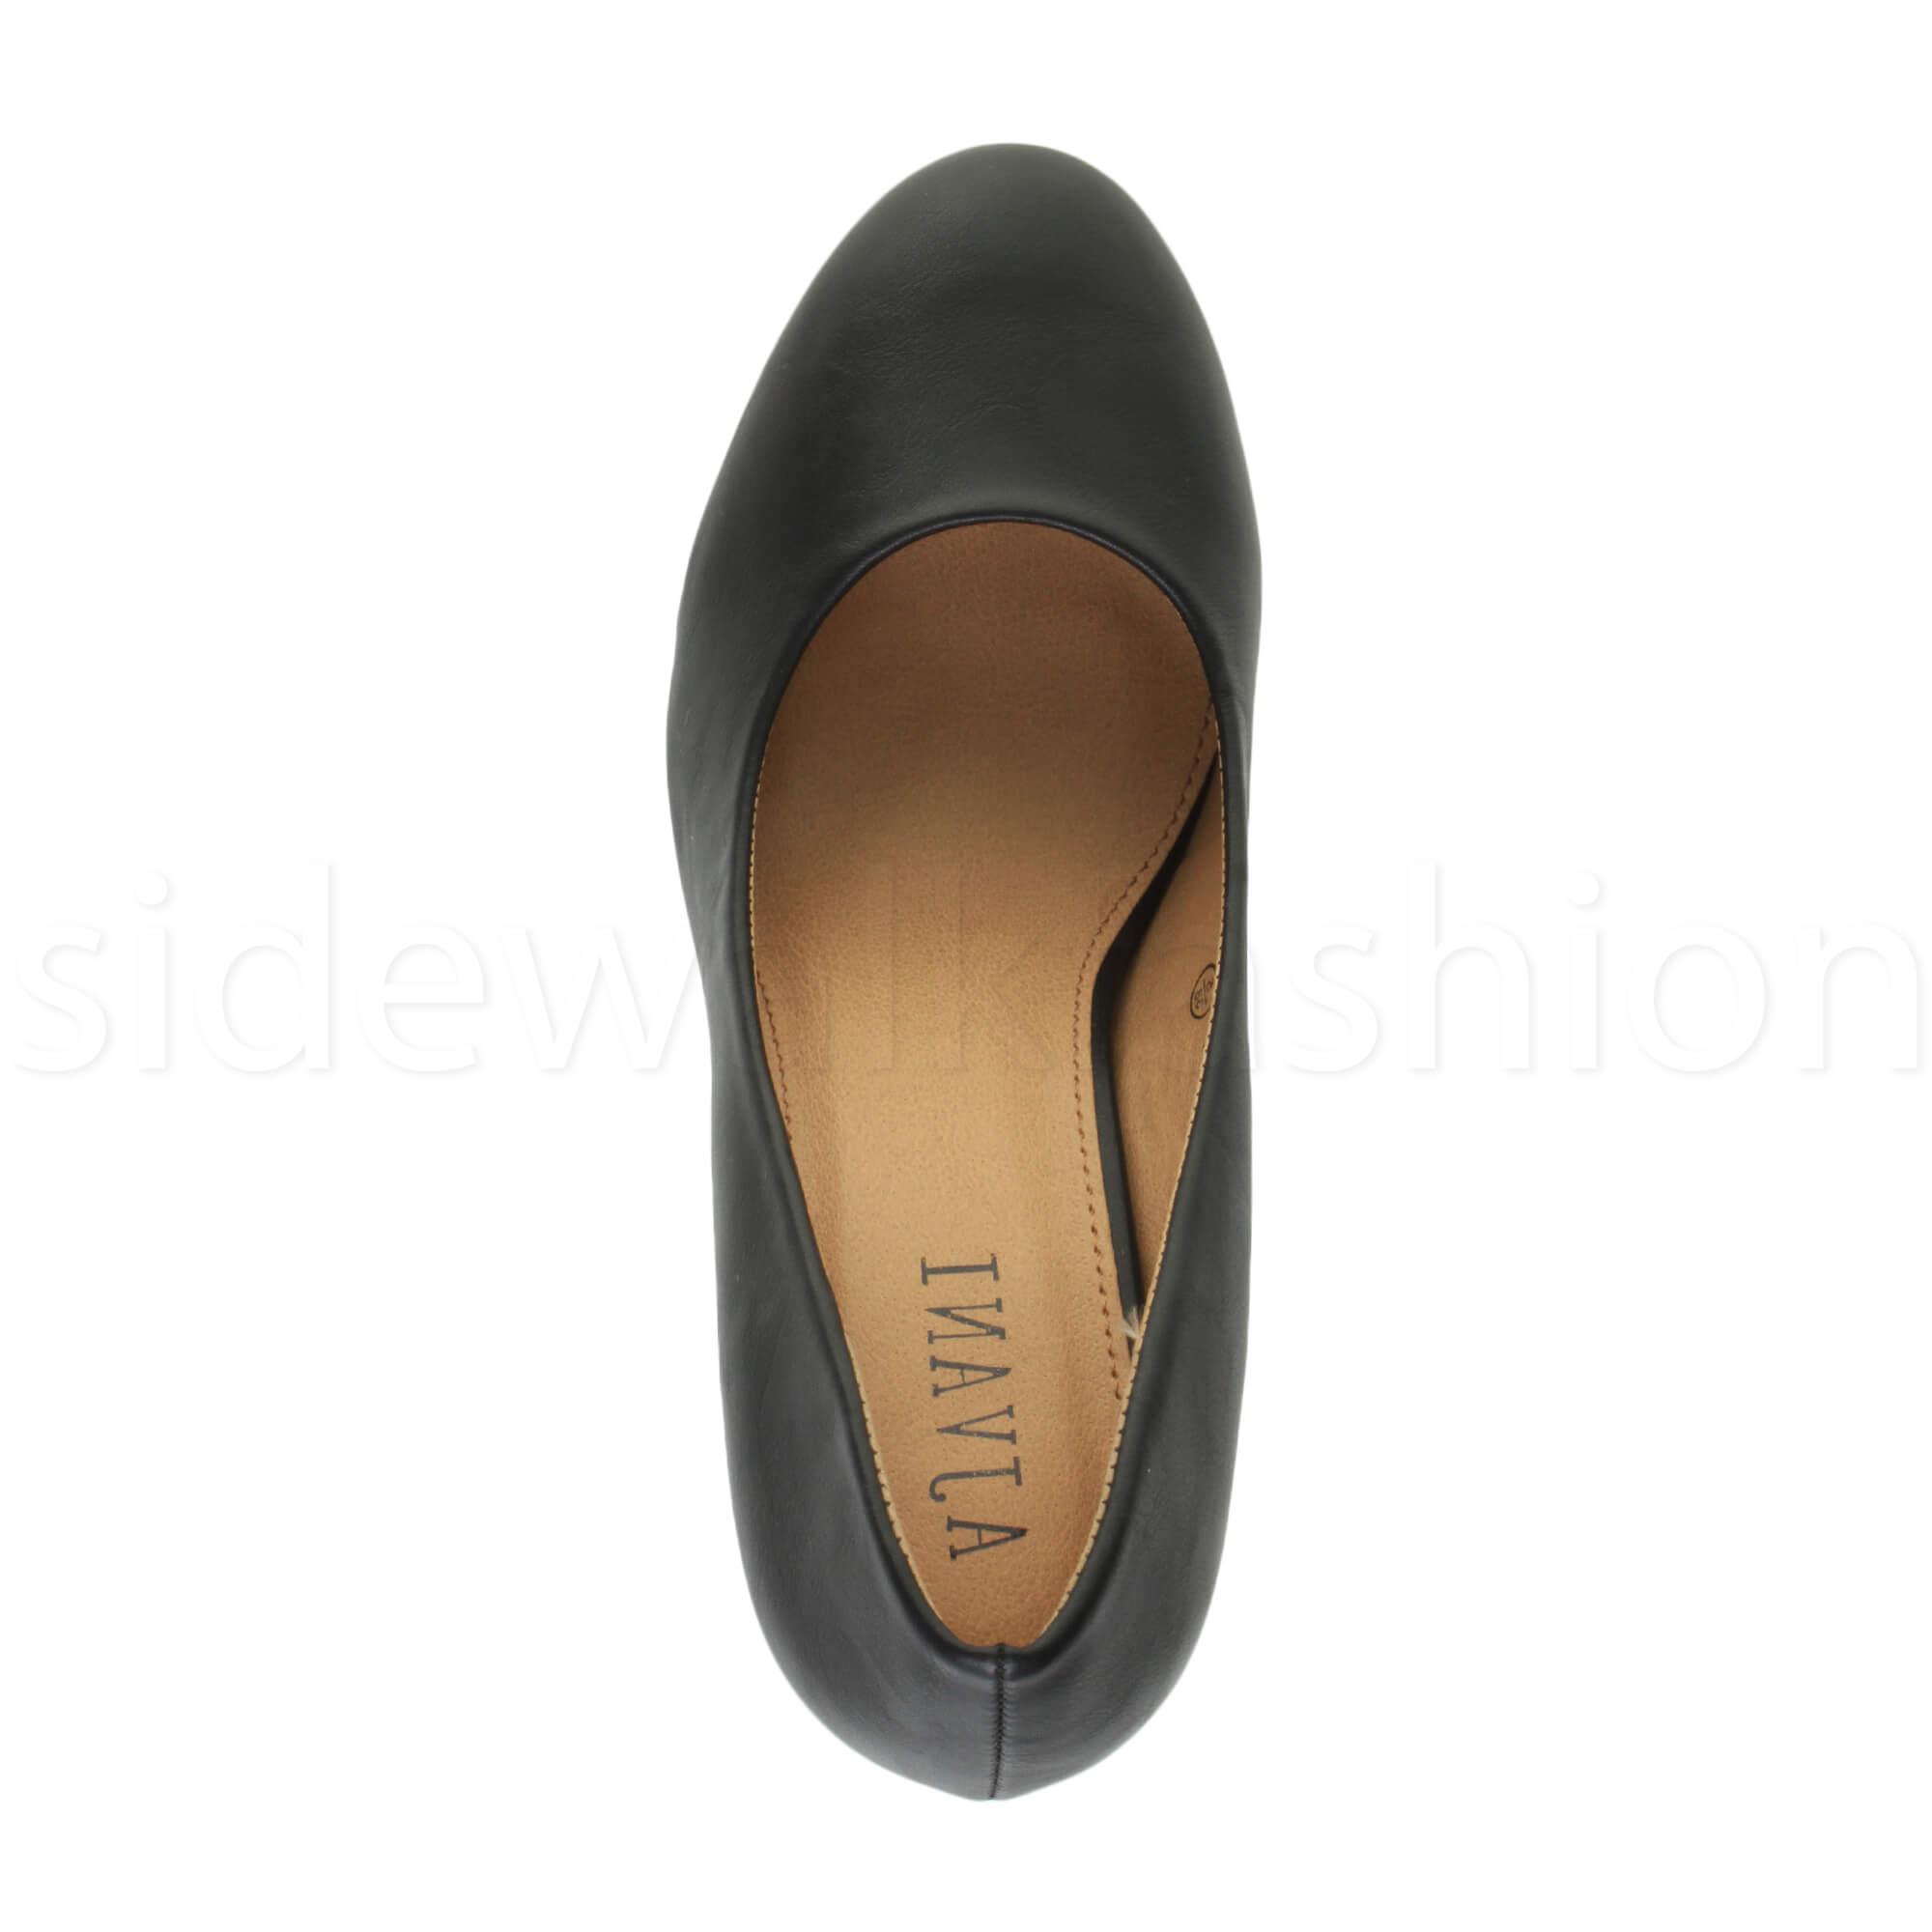 Womens-ladies-high-mid-heel-platform-wedding-evening-bridesmaid-court-shoes-size thumbnail 21